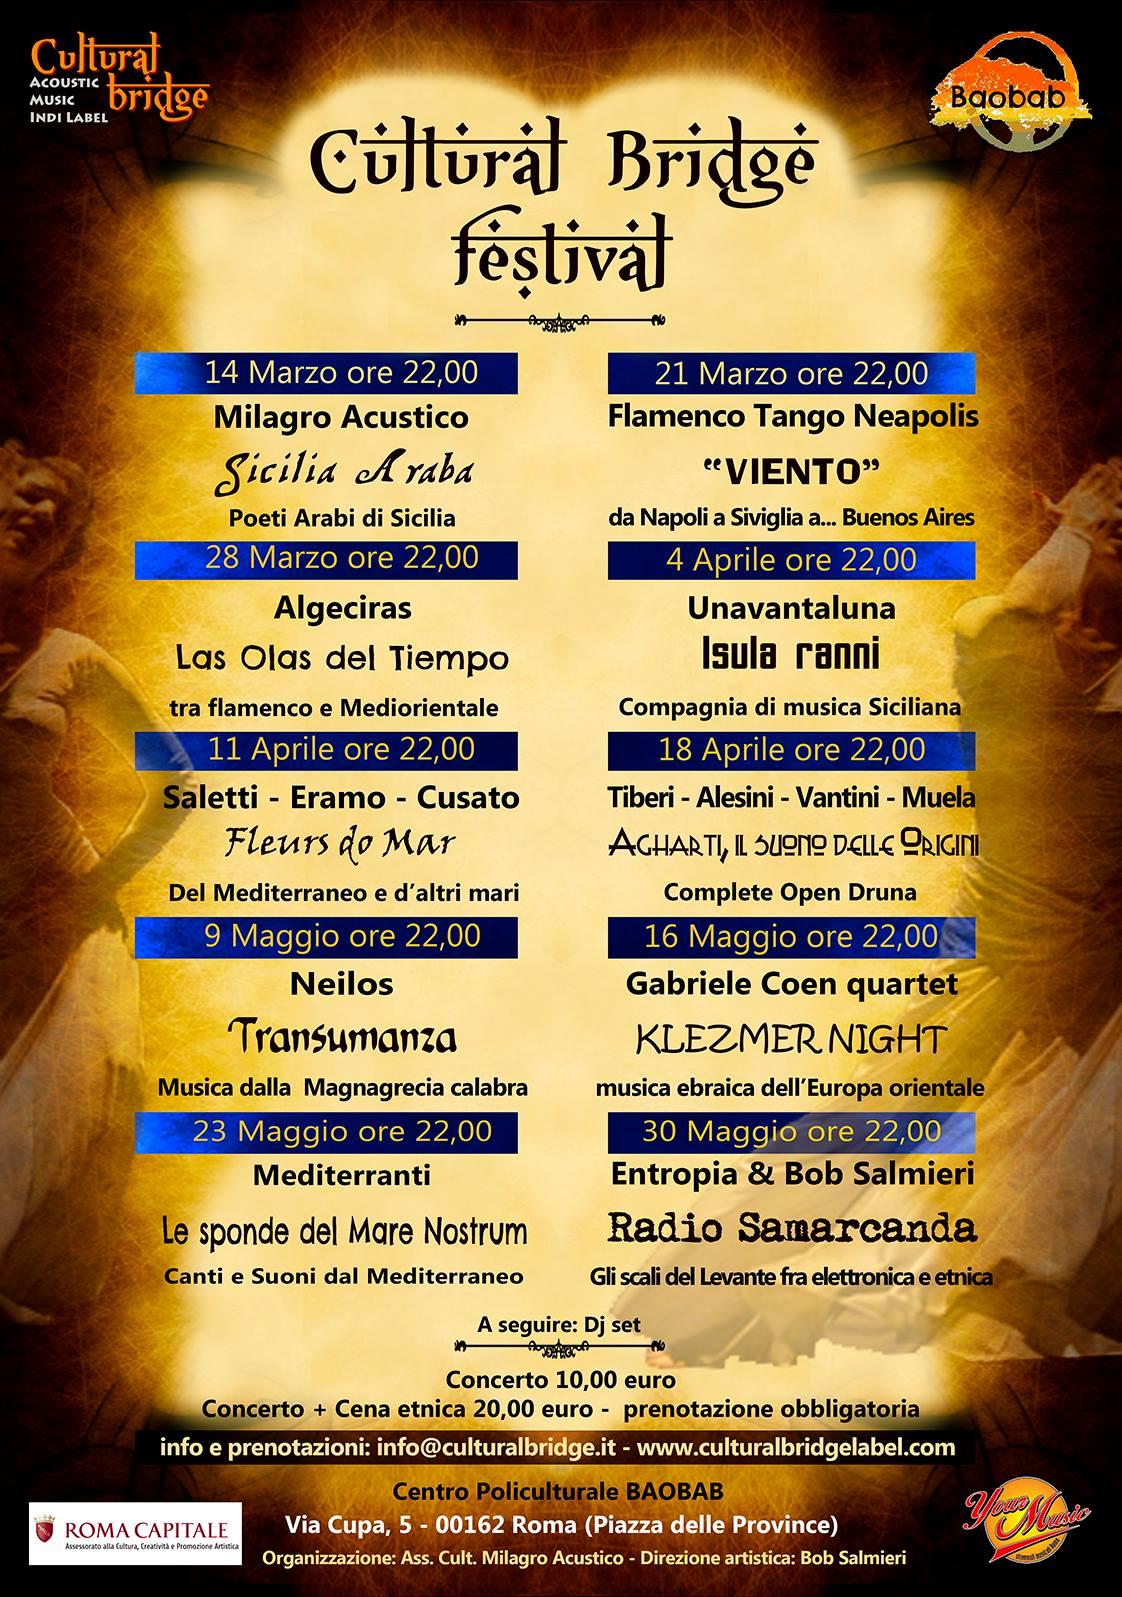 2014 Cultural Bridge Festival